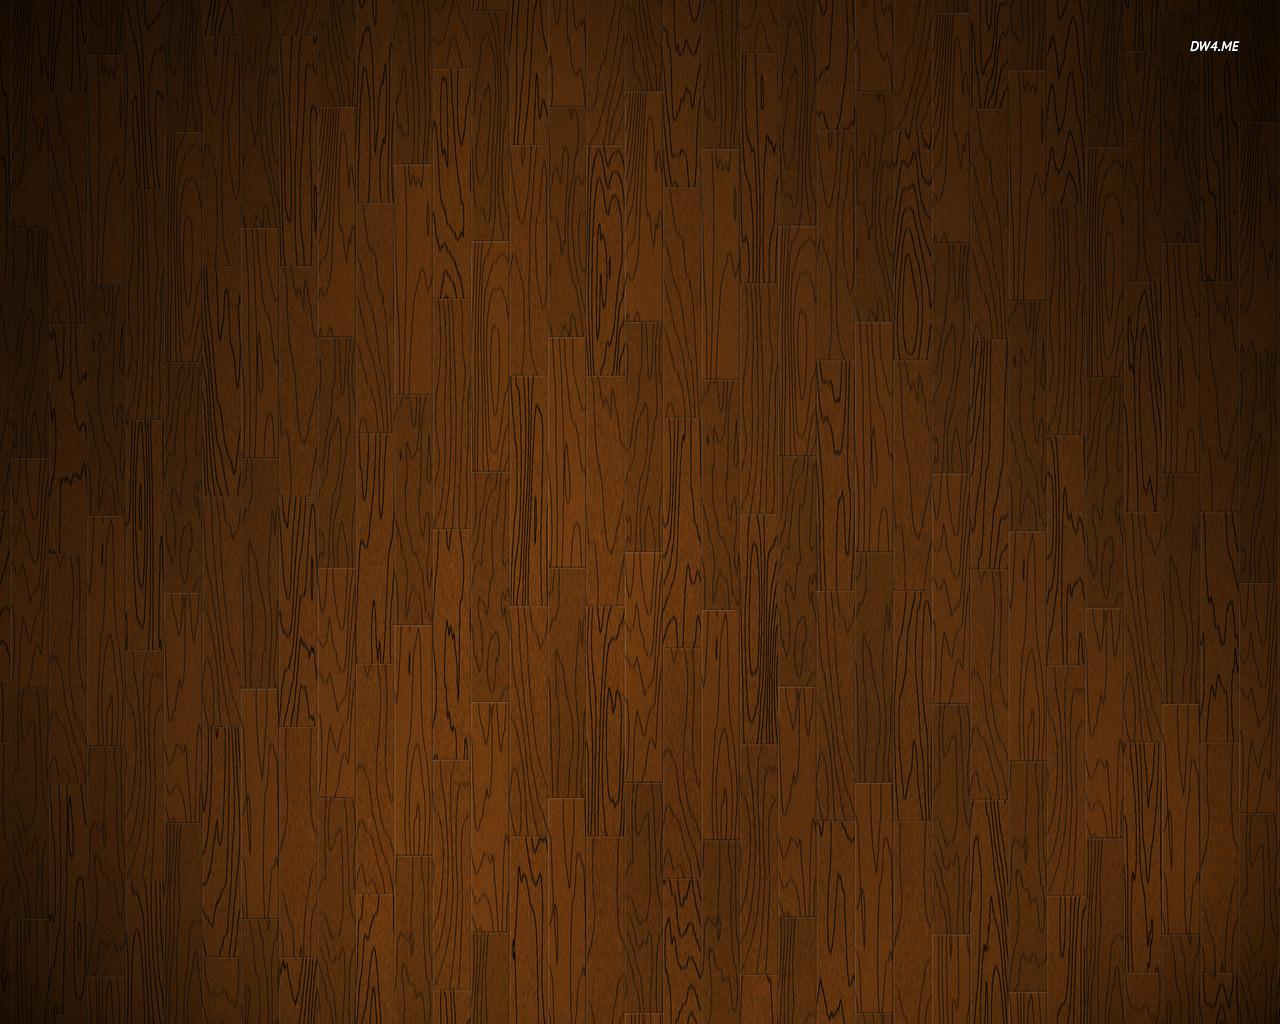 Hardwood floor pattern wallpaper   Digital Art wallpapers   781 1280x1024